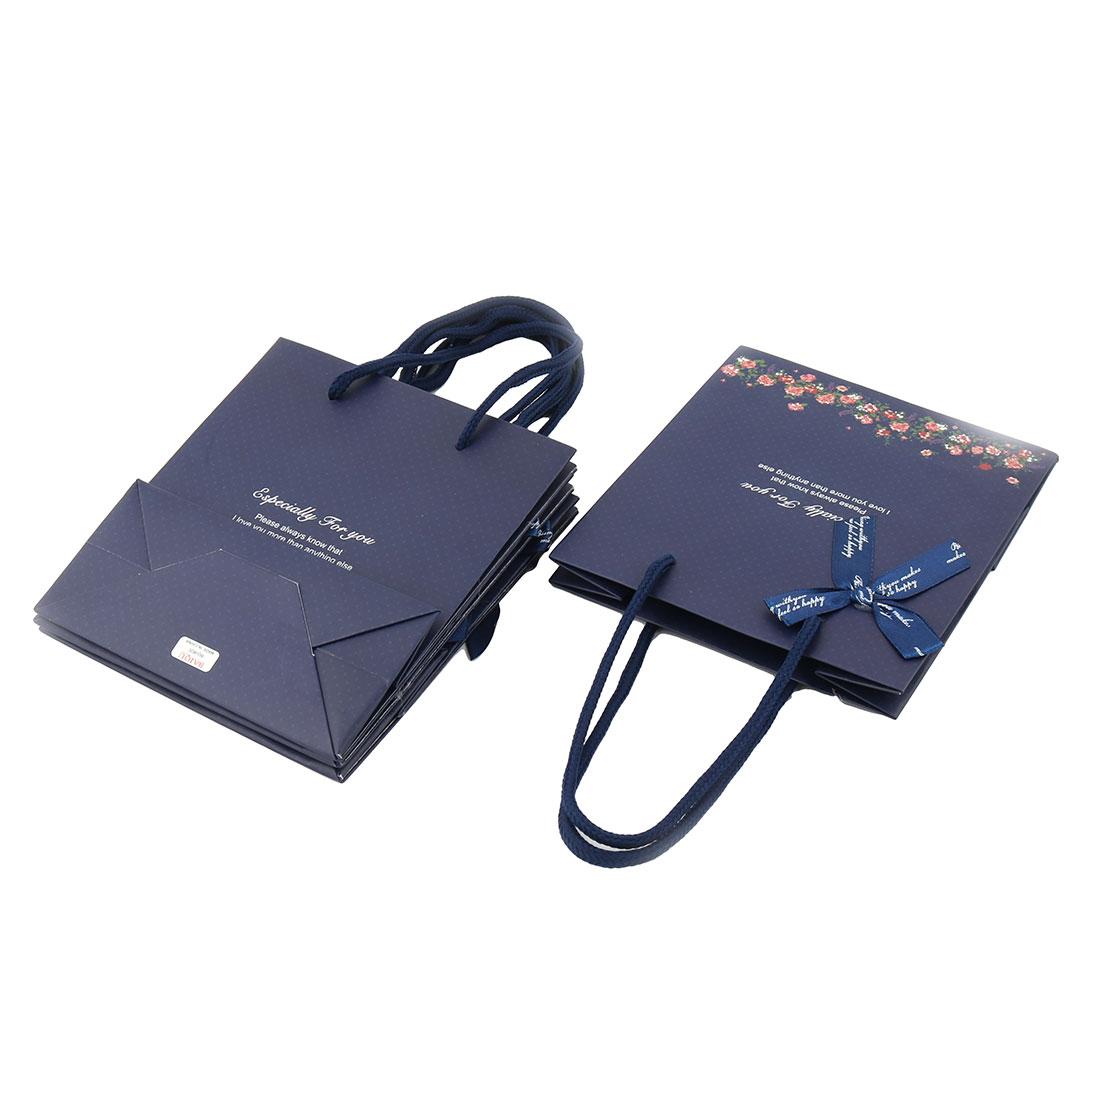 Boutique Retail Bowknot Decor Foldable Holder Handbag Wrapper Gift Bags 4 PCS